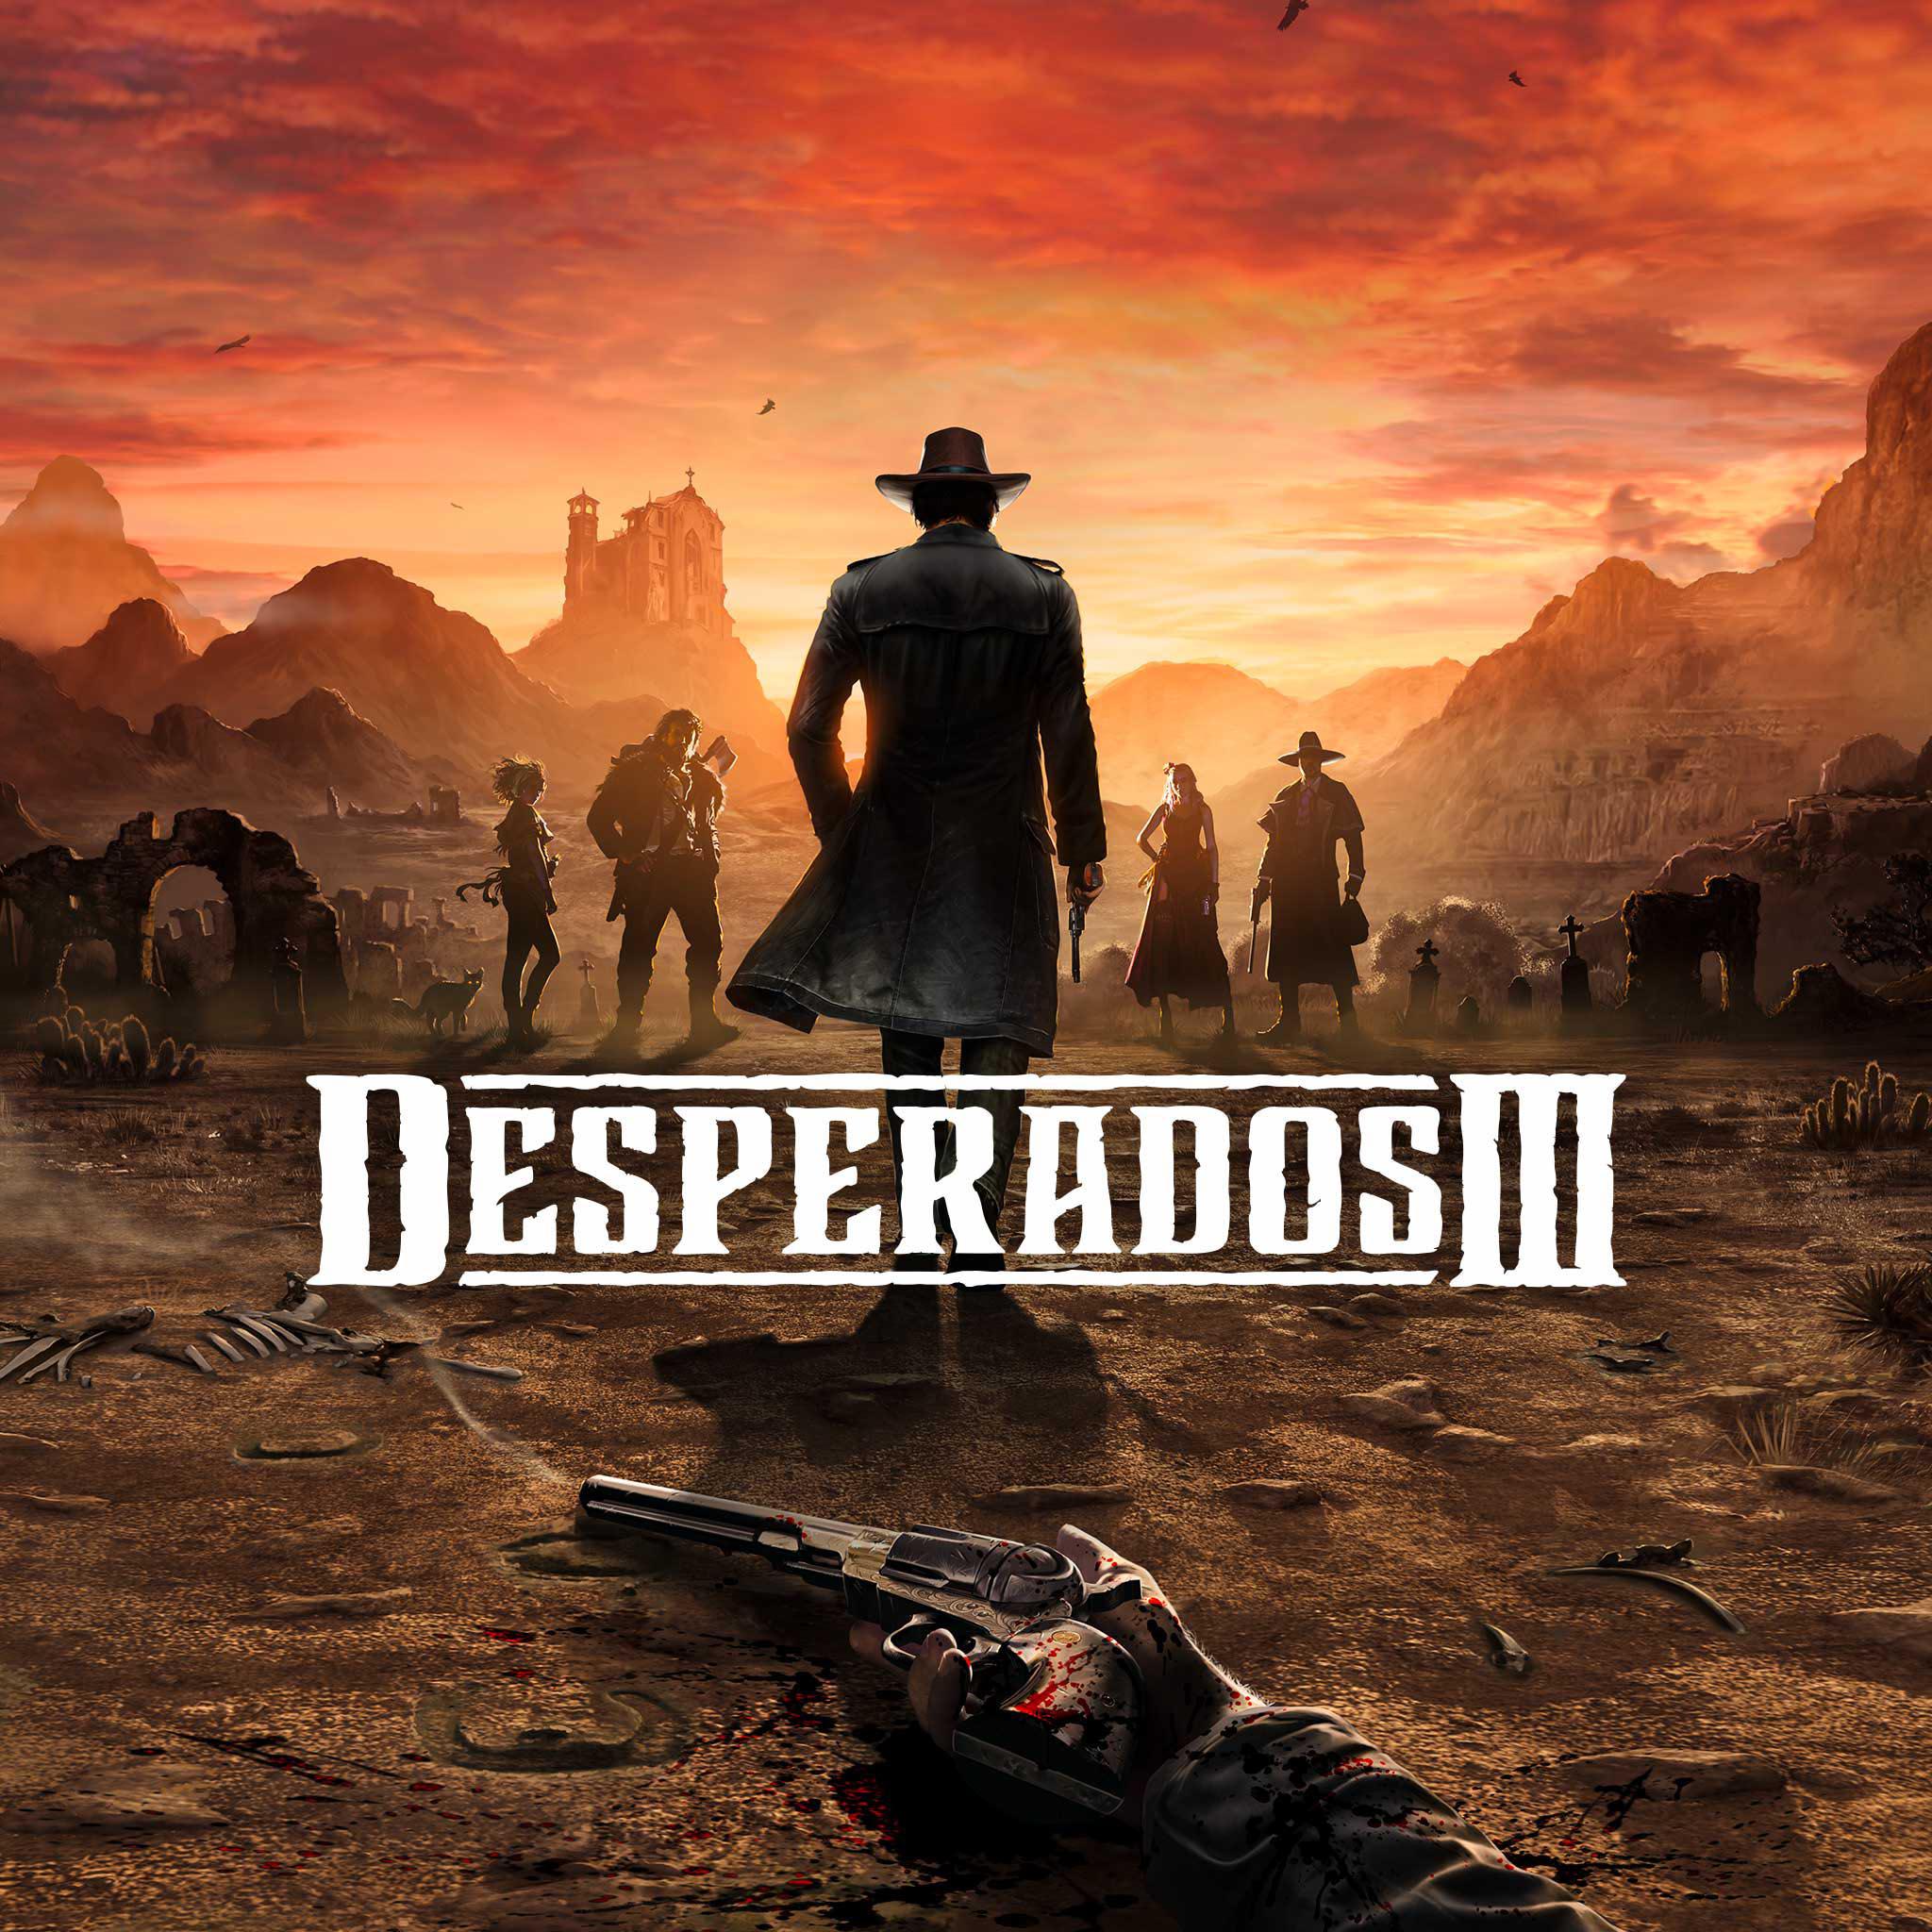 Desperados Iii Digital Deluxe On Ps4 Official Playstation Store Us